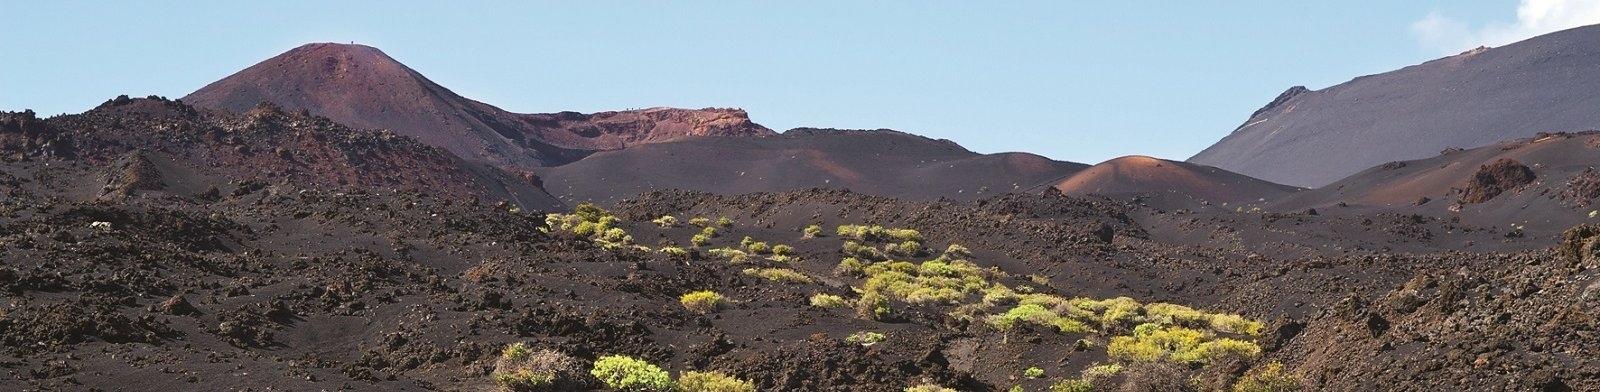 La Palma landscape